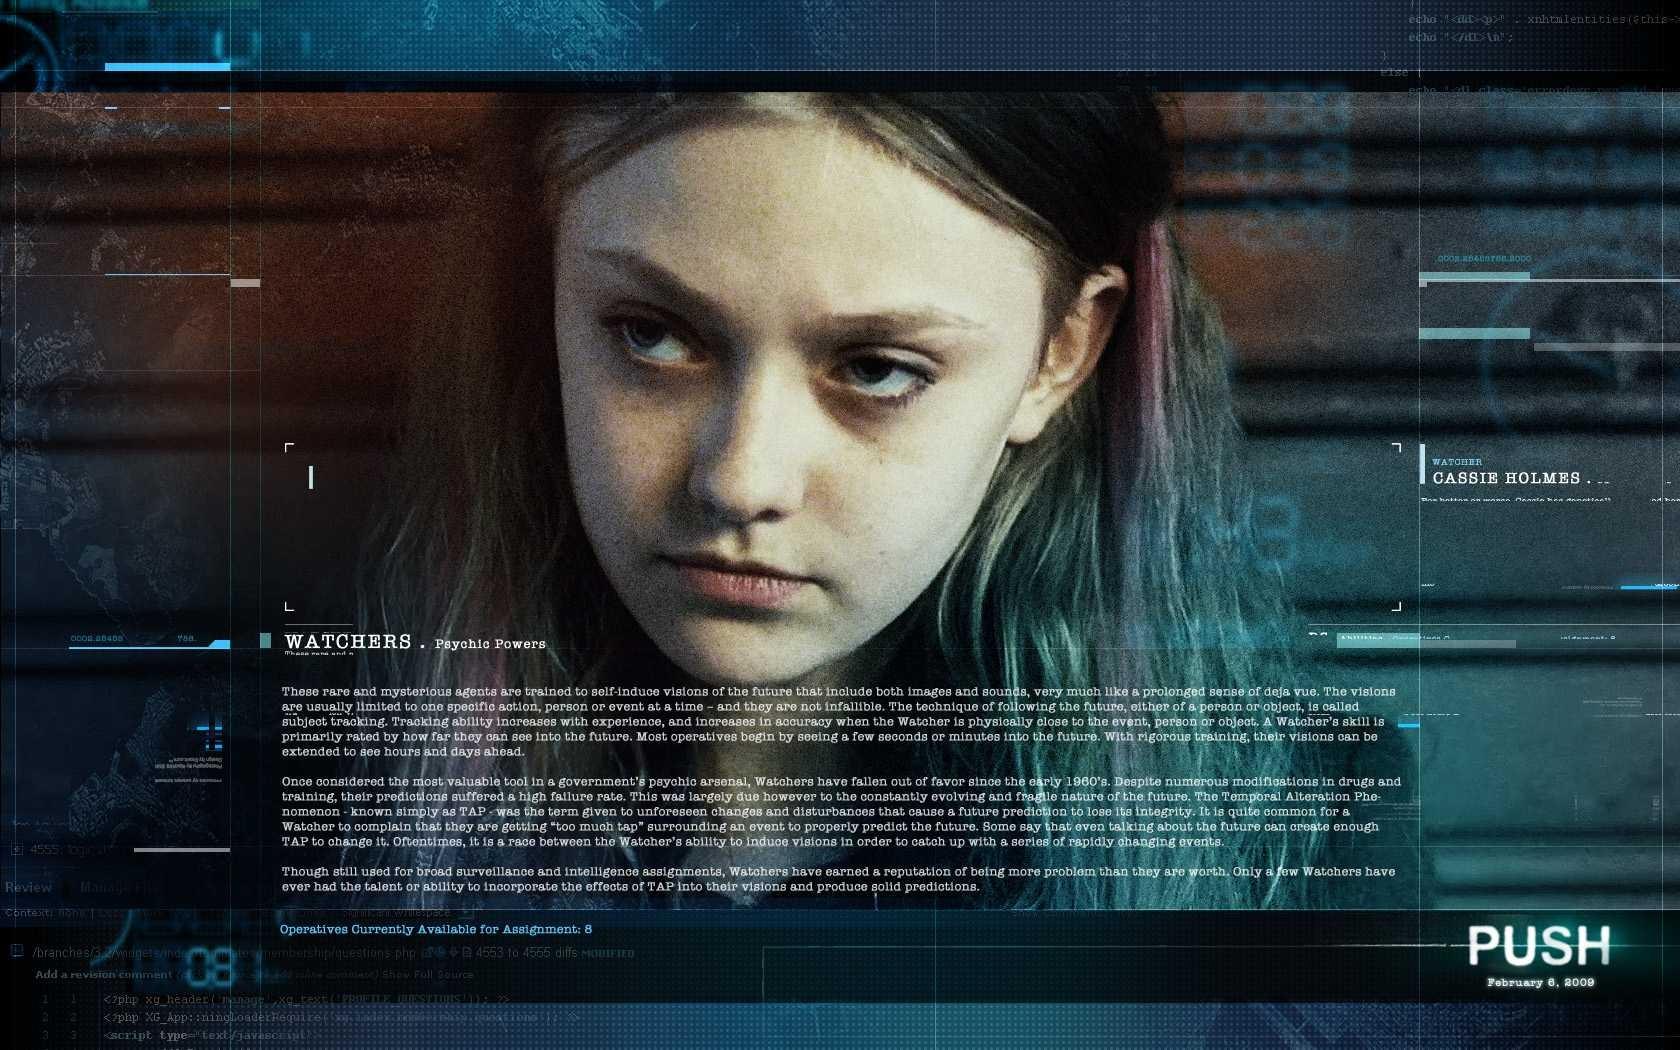 Un wallpaper del film Push con Dakota Fanning